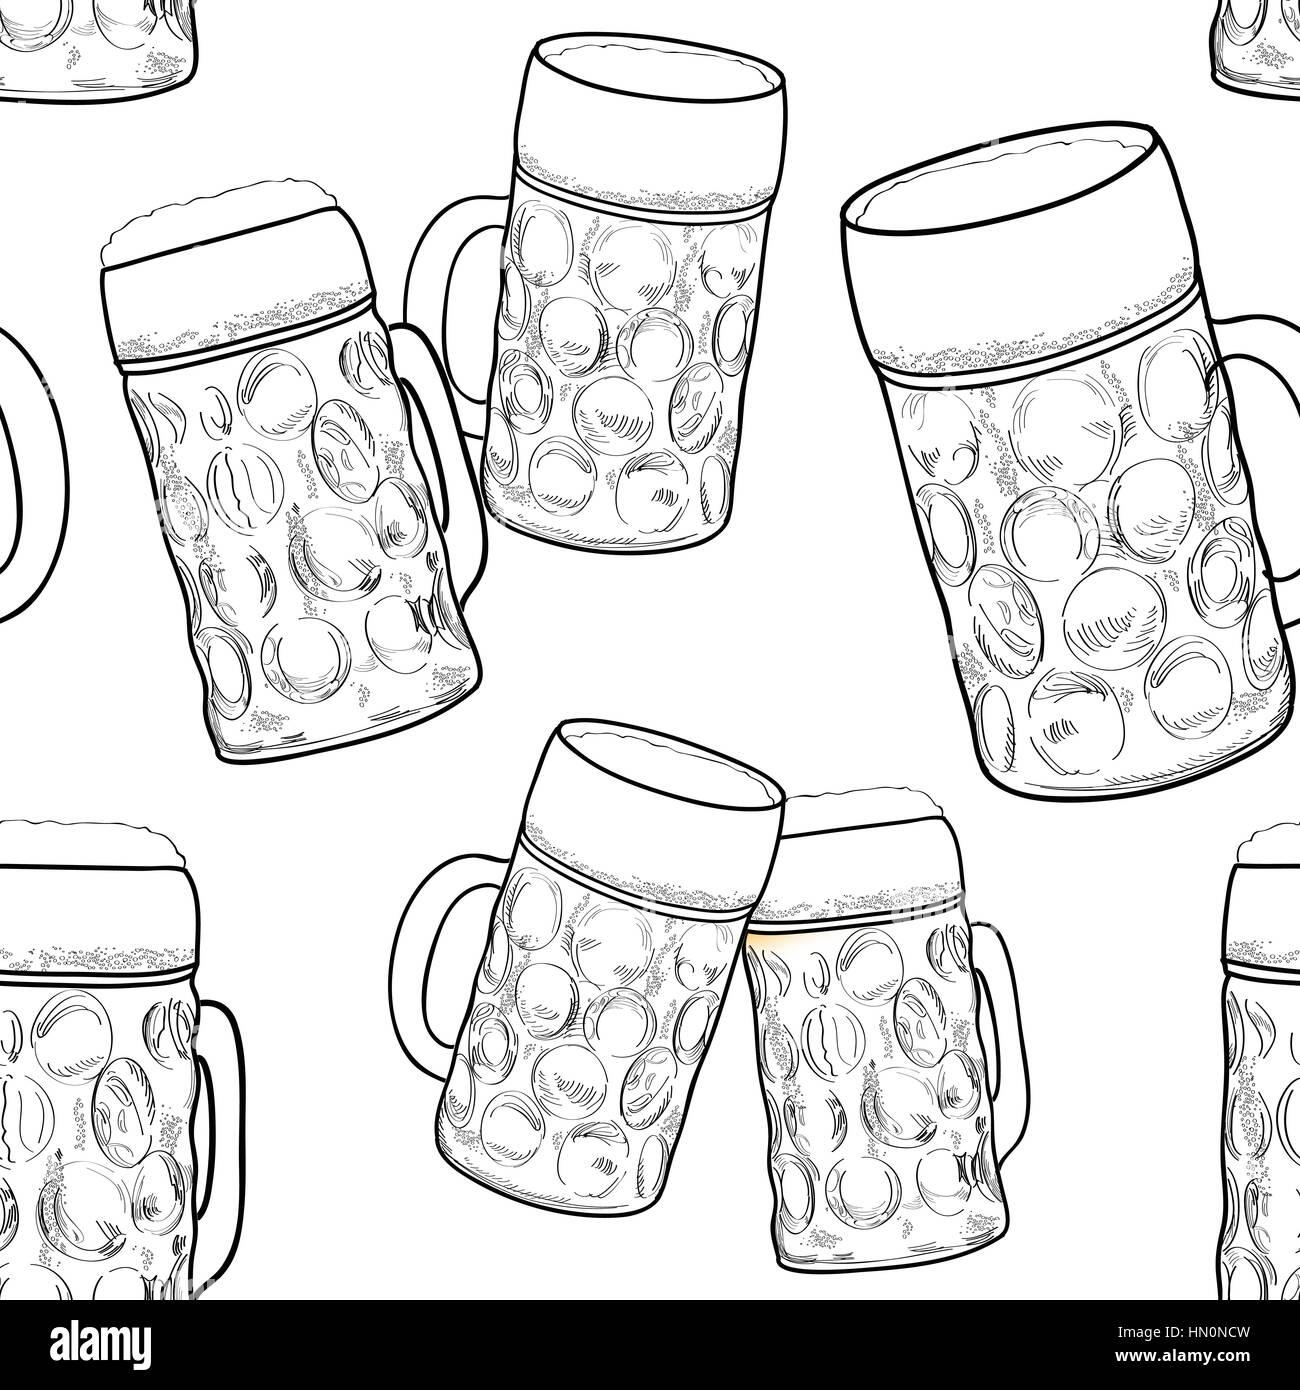 Beer seamless pattern. Ornamental background with beer mug. Beer glass sketch. Octoberfest beer fest pattern - Stock Vector